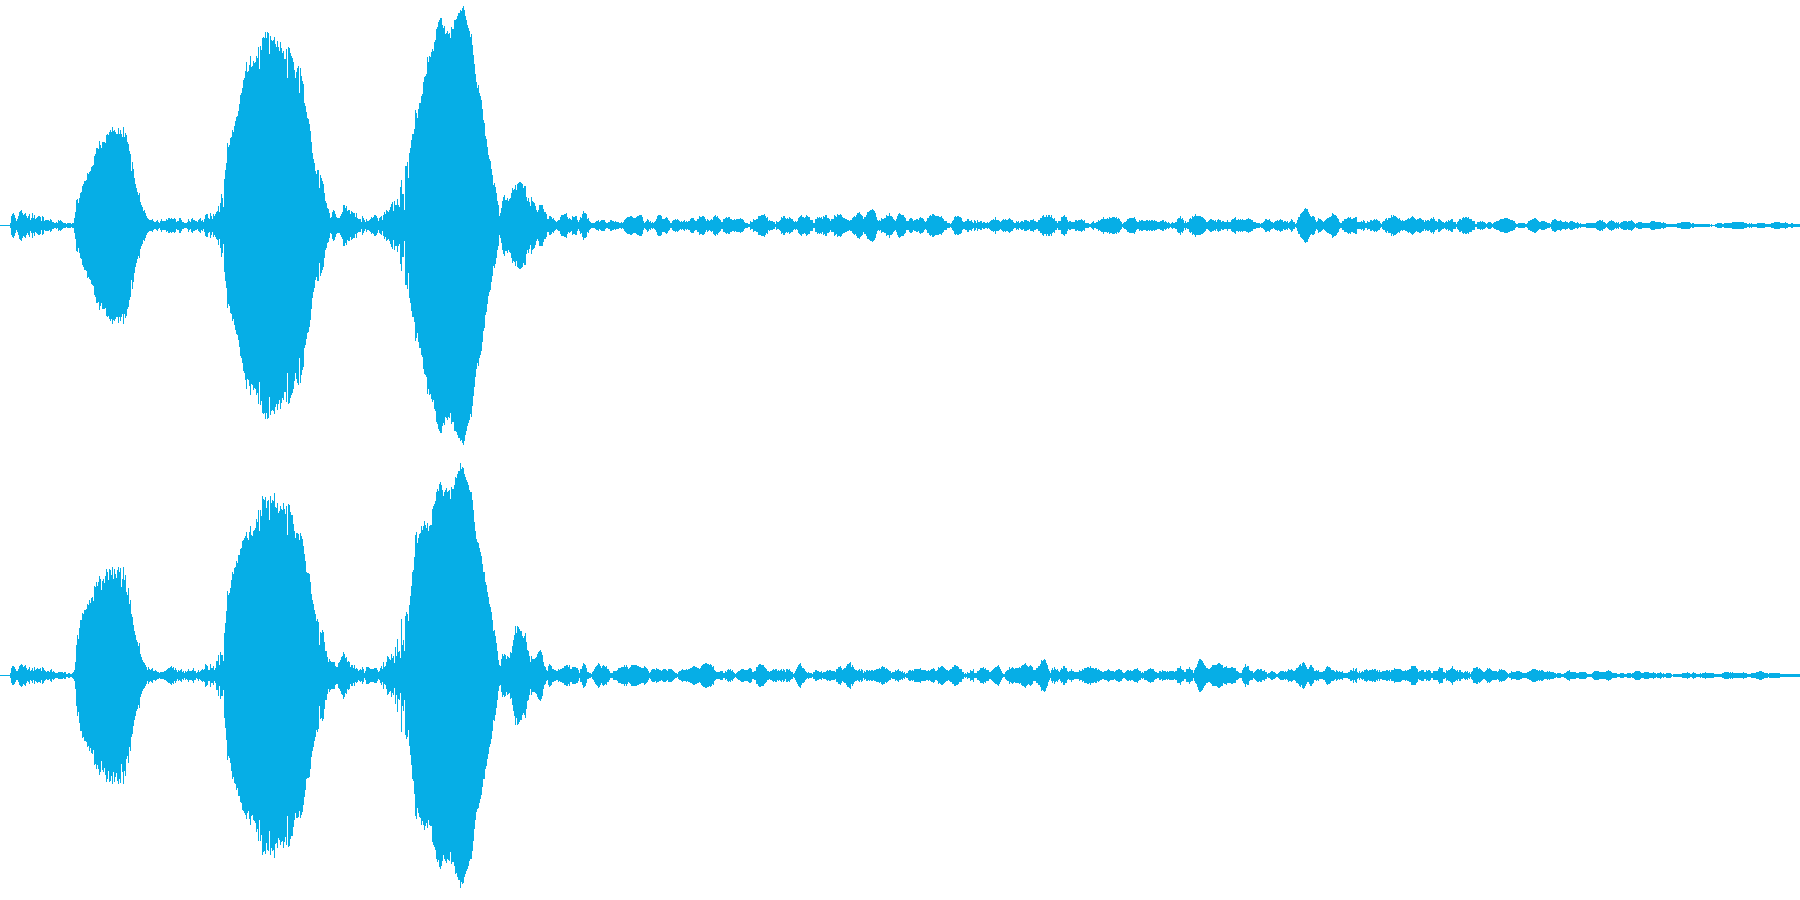 Animal 鳥の鳴き声 教育用途にの再生済みの波形